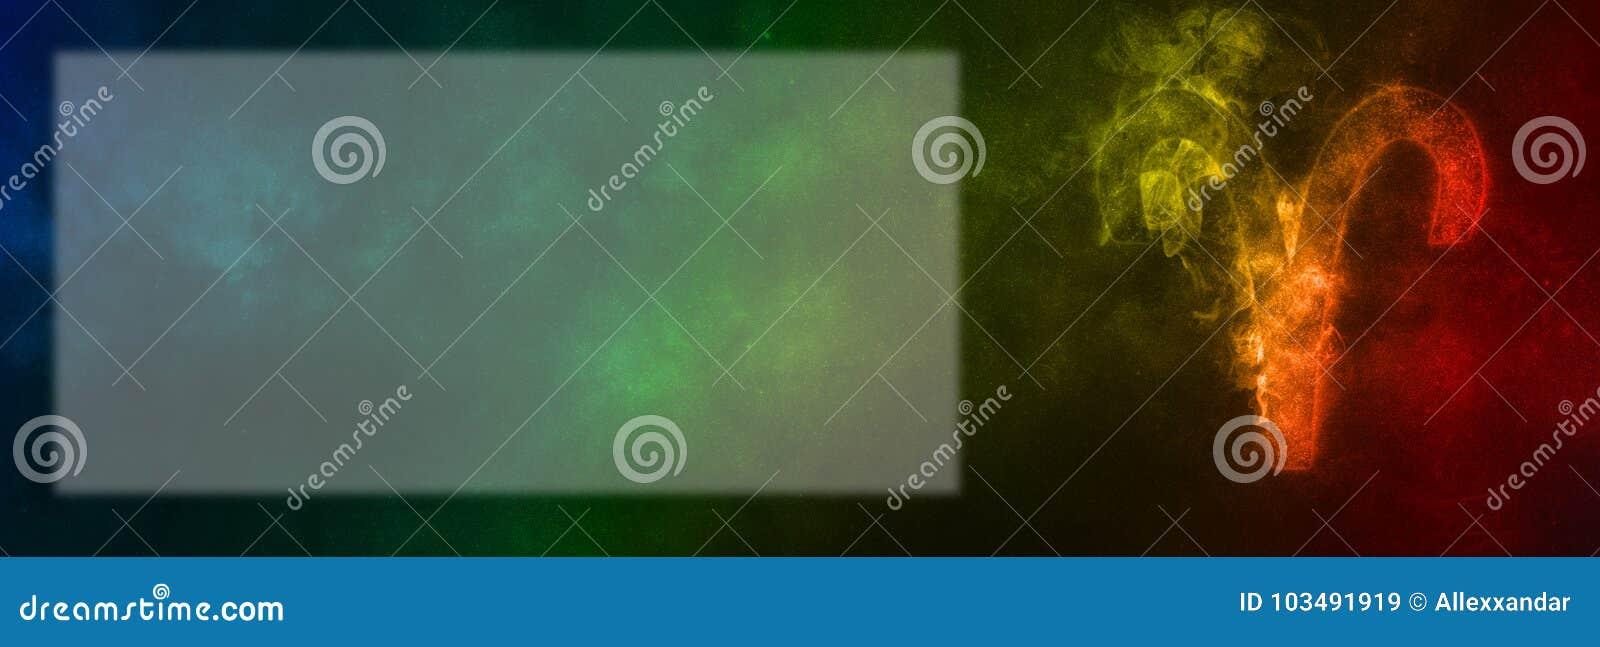 Aries Zodiac Sign Signe d horoscope de Bélier Pièce des textes de calibre